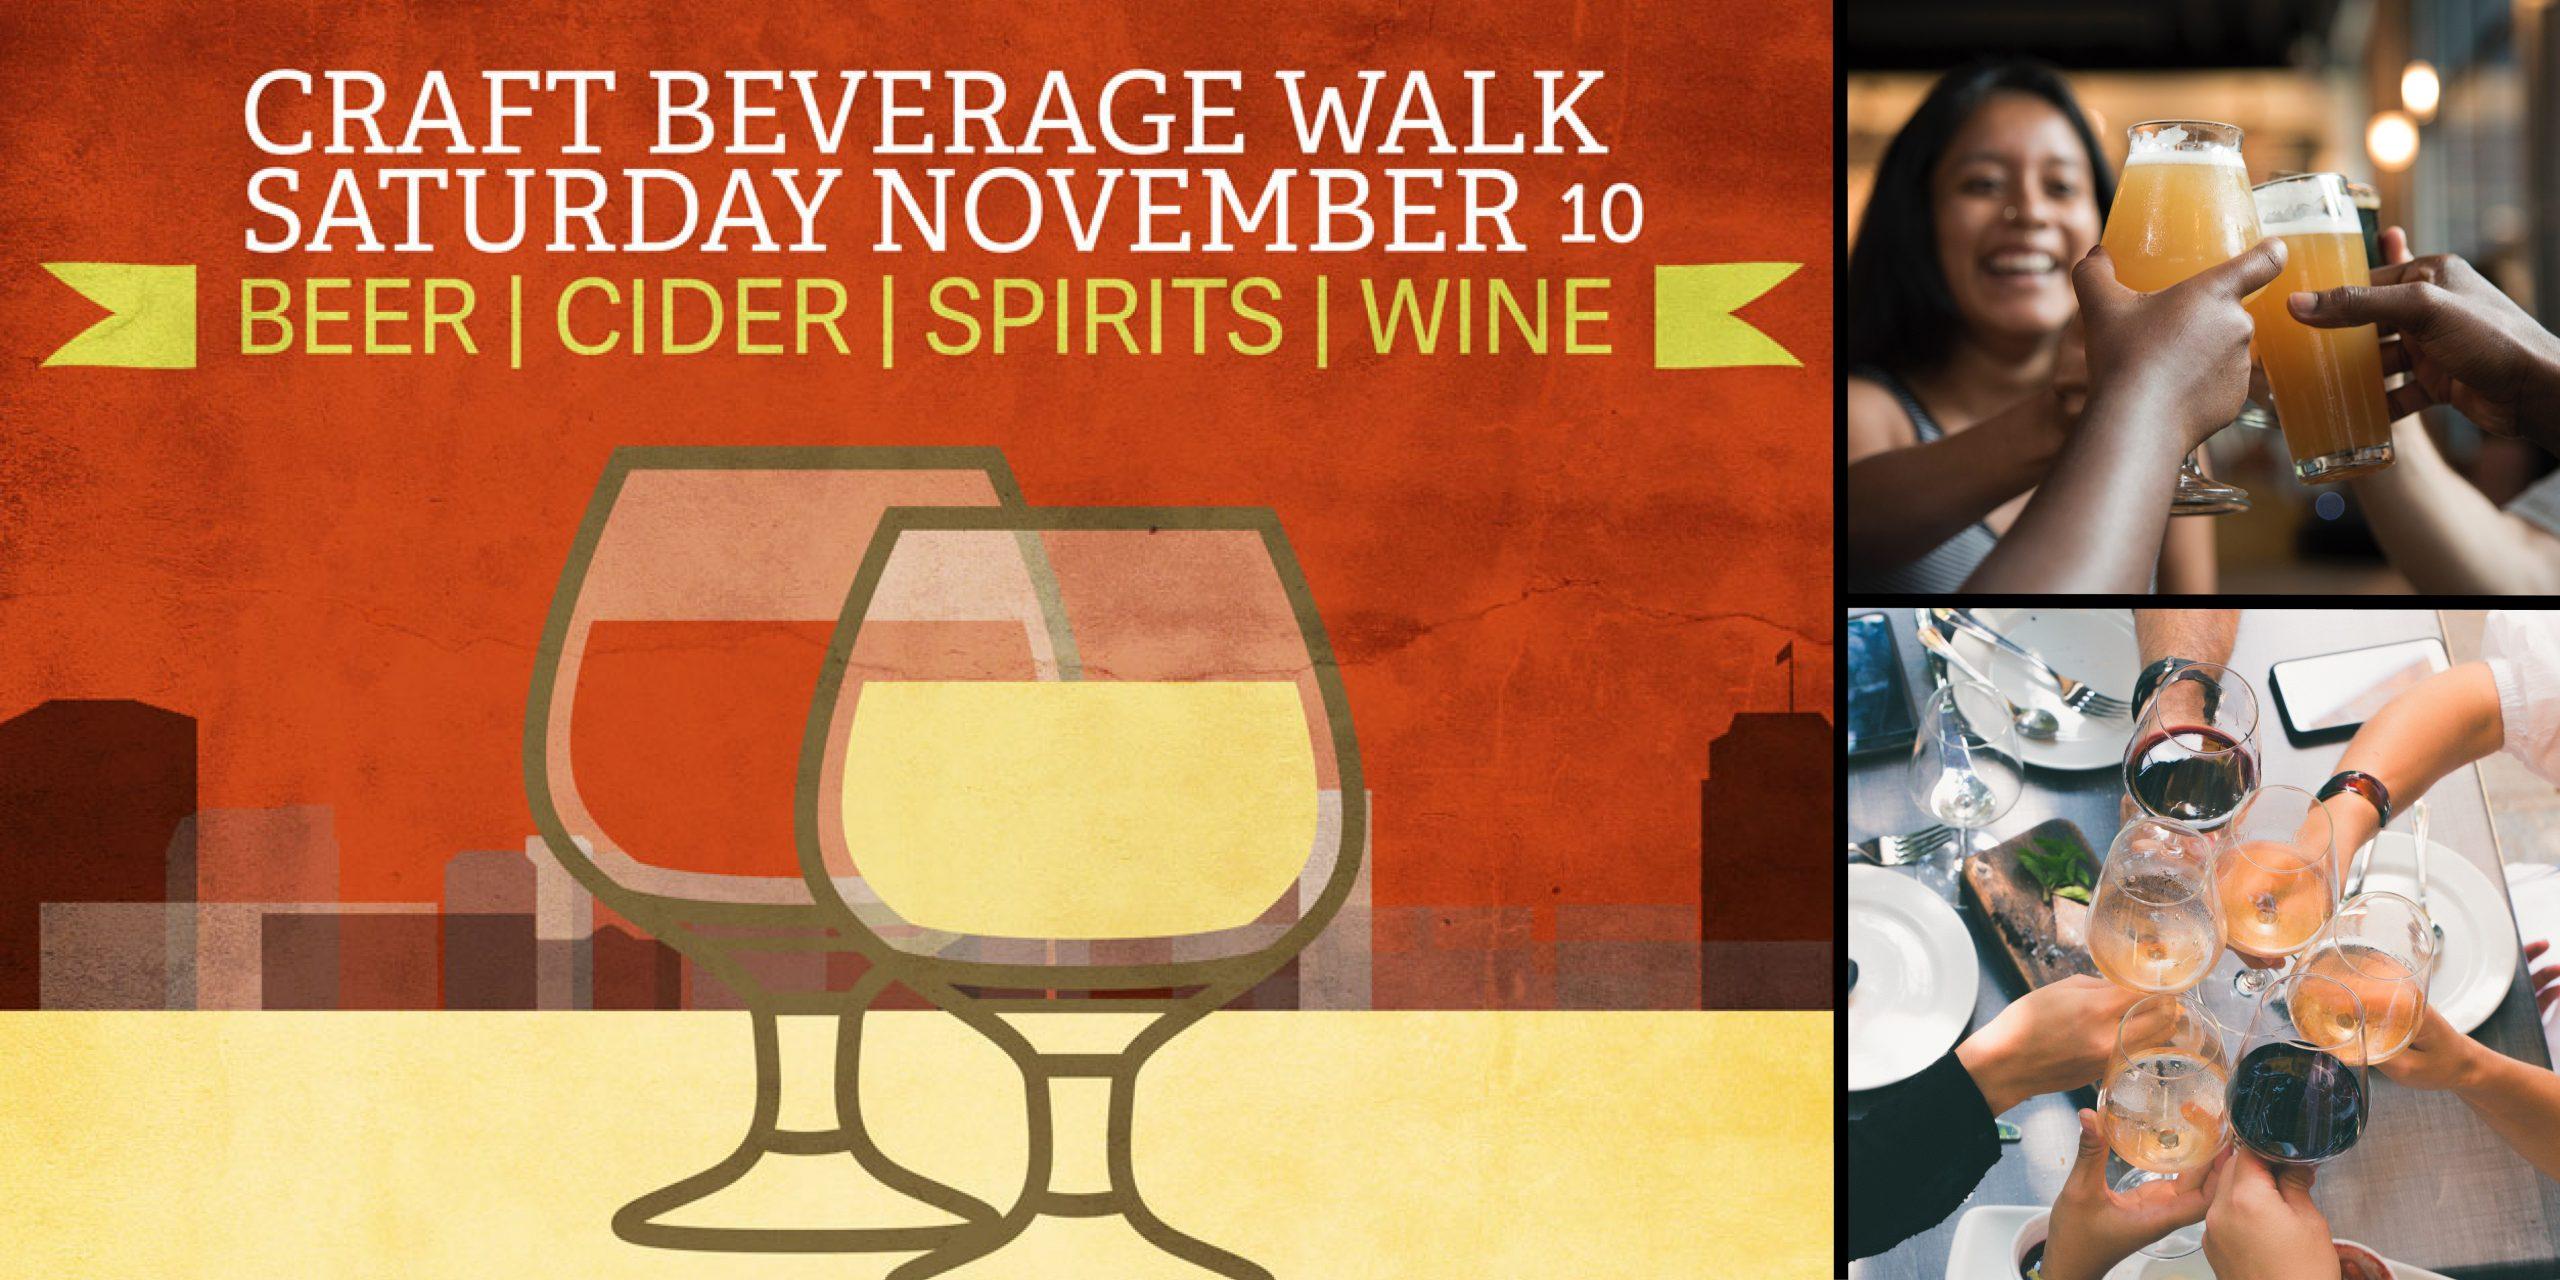 Feature: http://d1467.cms.socastsrm.com/the-craft-beverage-walk/